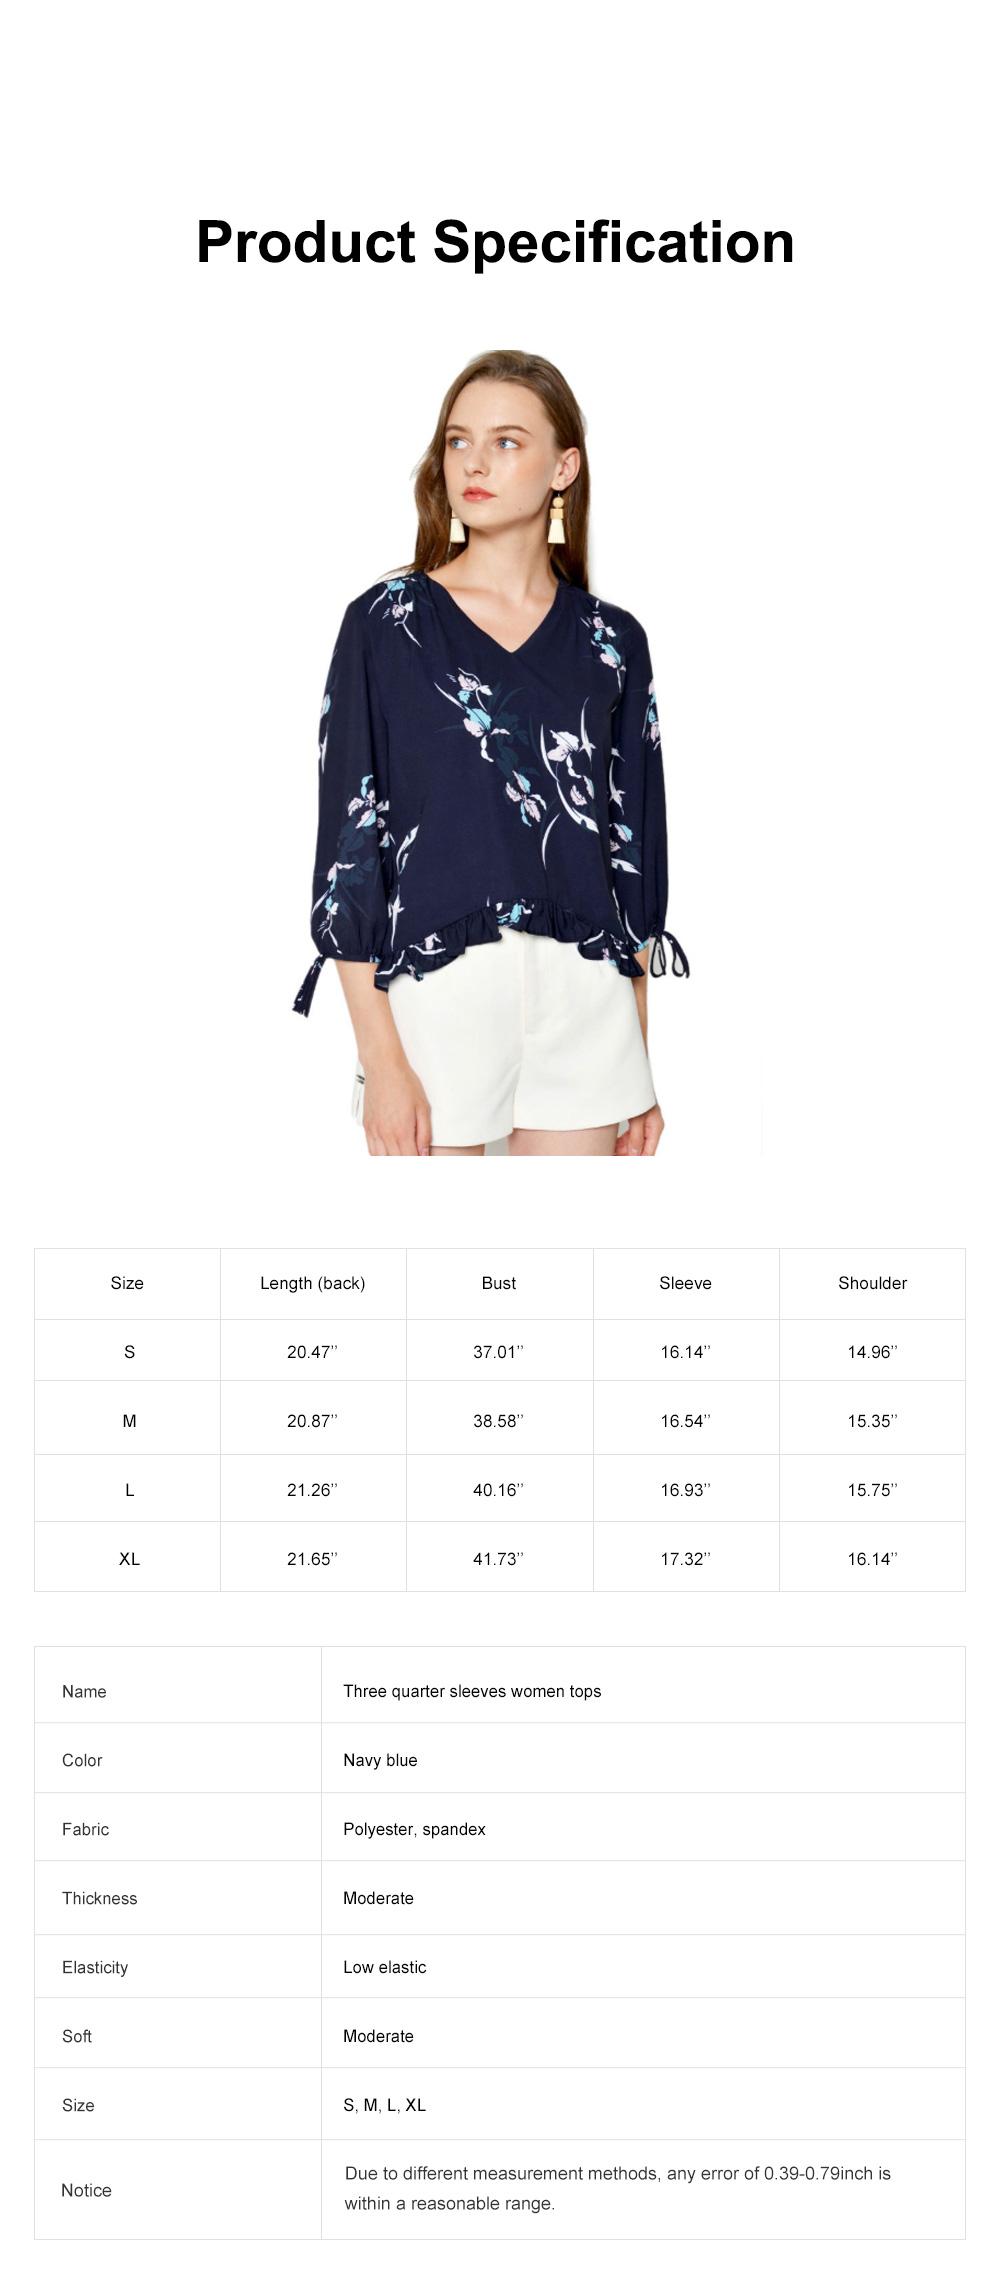 Fashion Navy Blue Printing Three Quarter Sleeves Women Tops, V-neckline Chiffon with Stringy Selvedge for Ladies 6